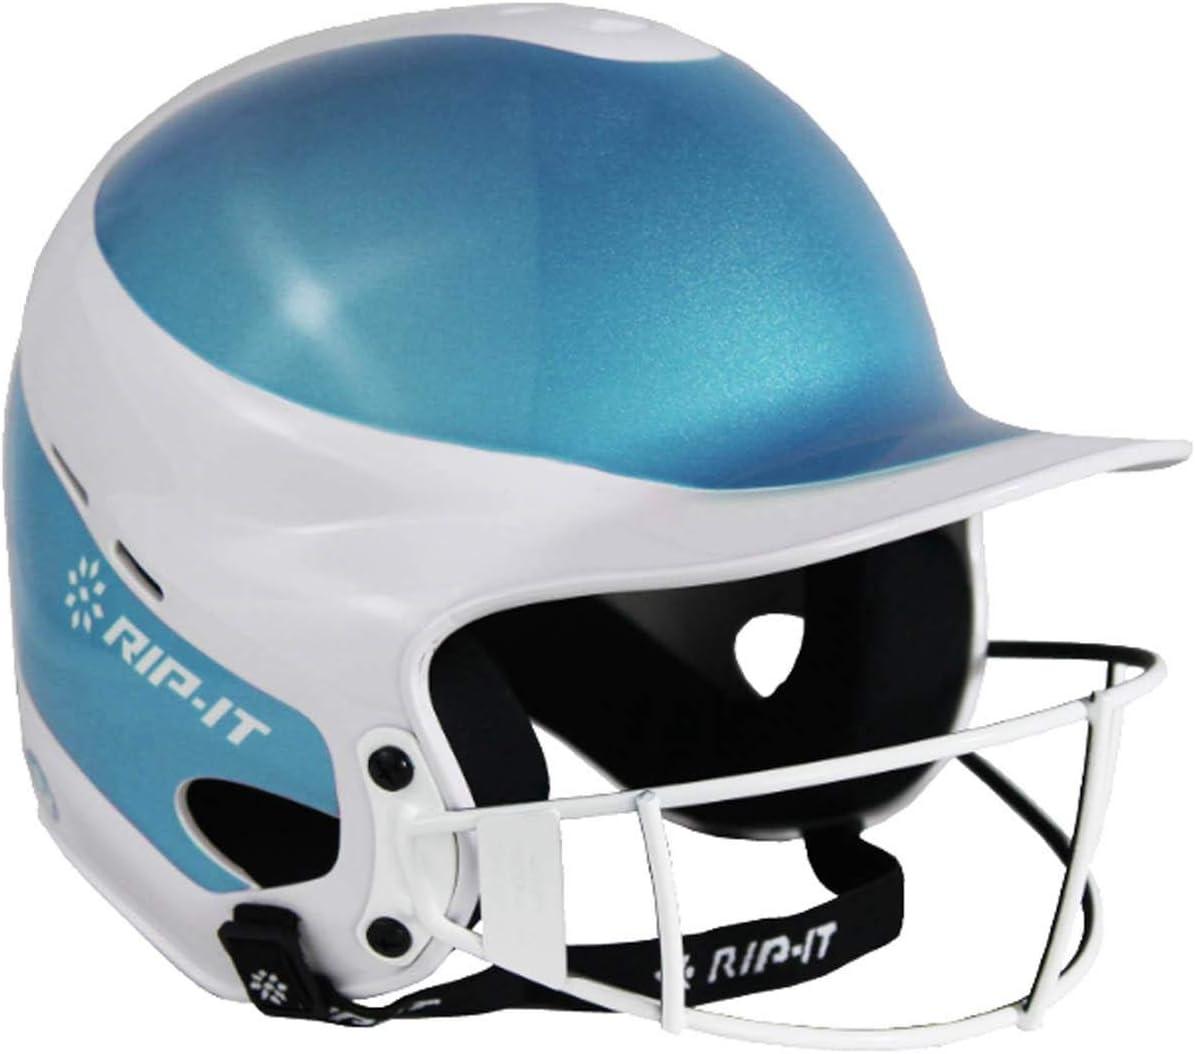 RIP-IT Vision Shimmer Softball Batting Helmet Pro Aqua M//L